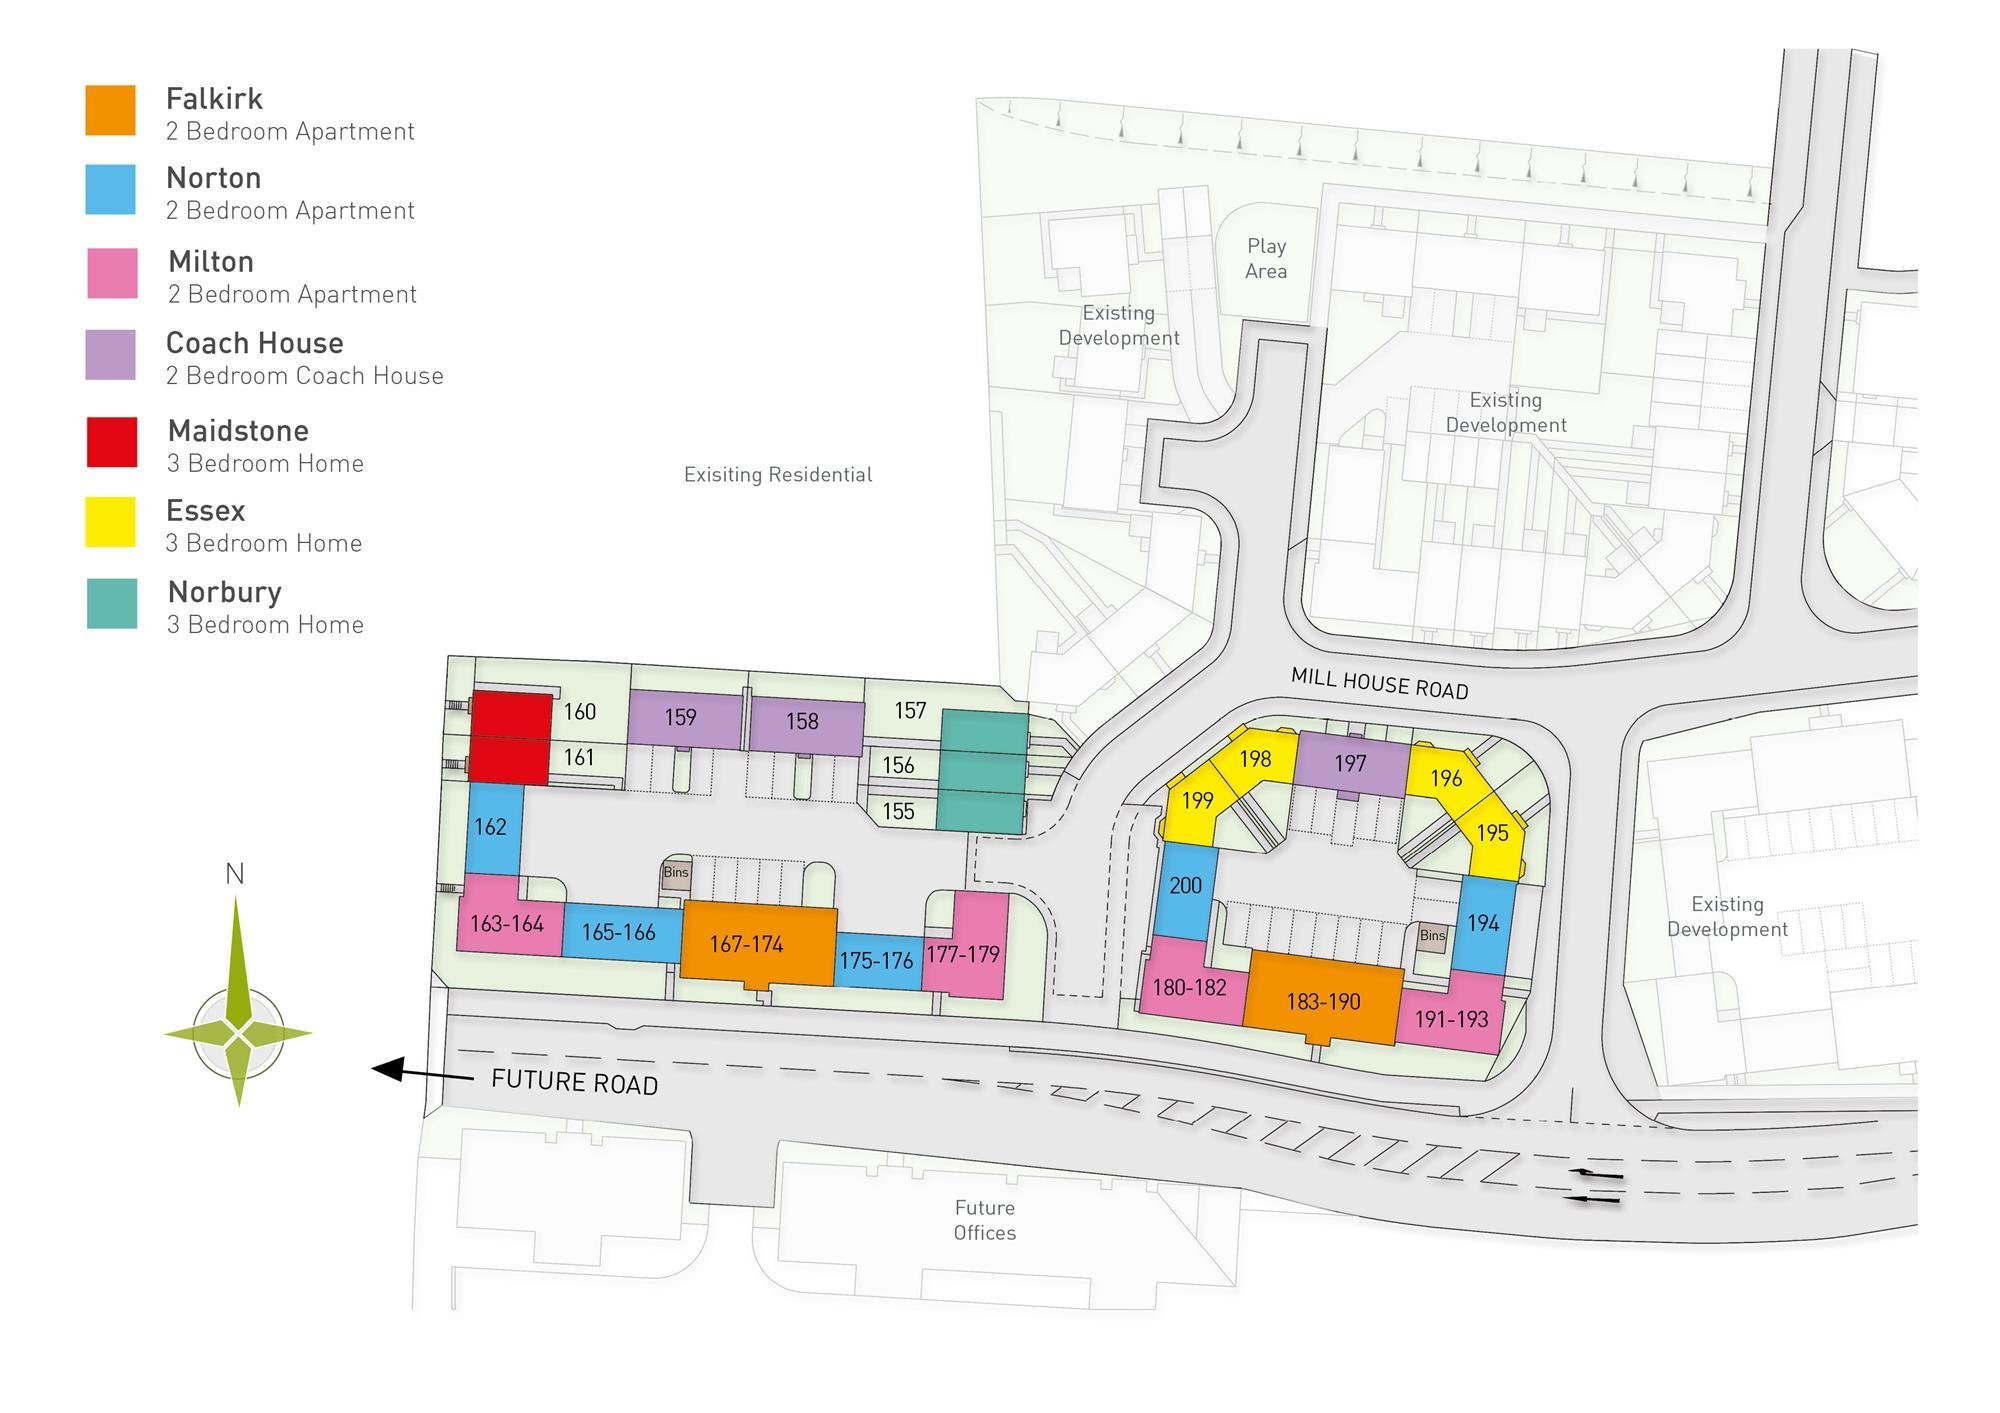 Development layout - Phase 1